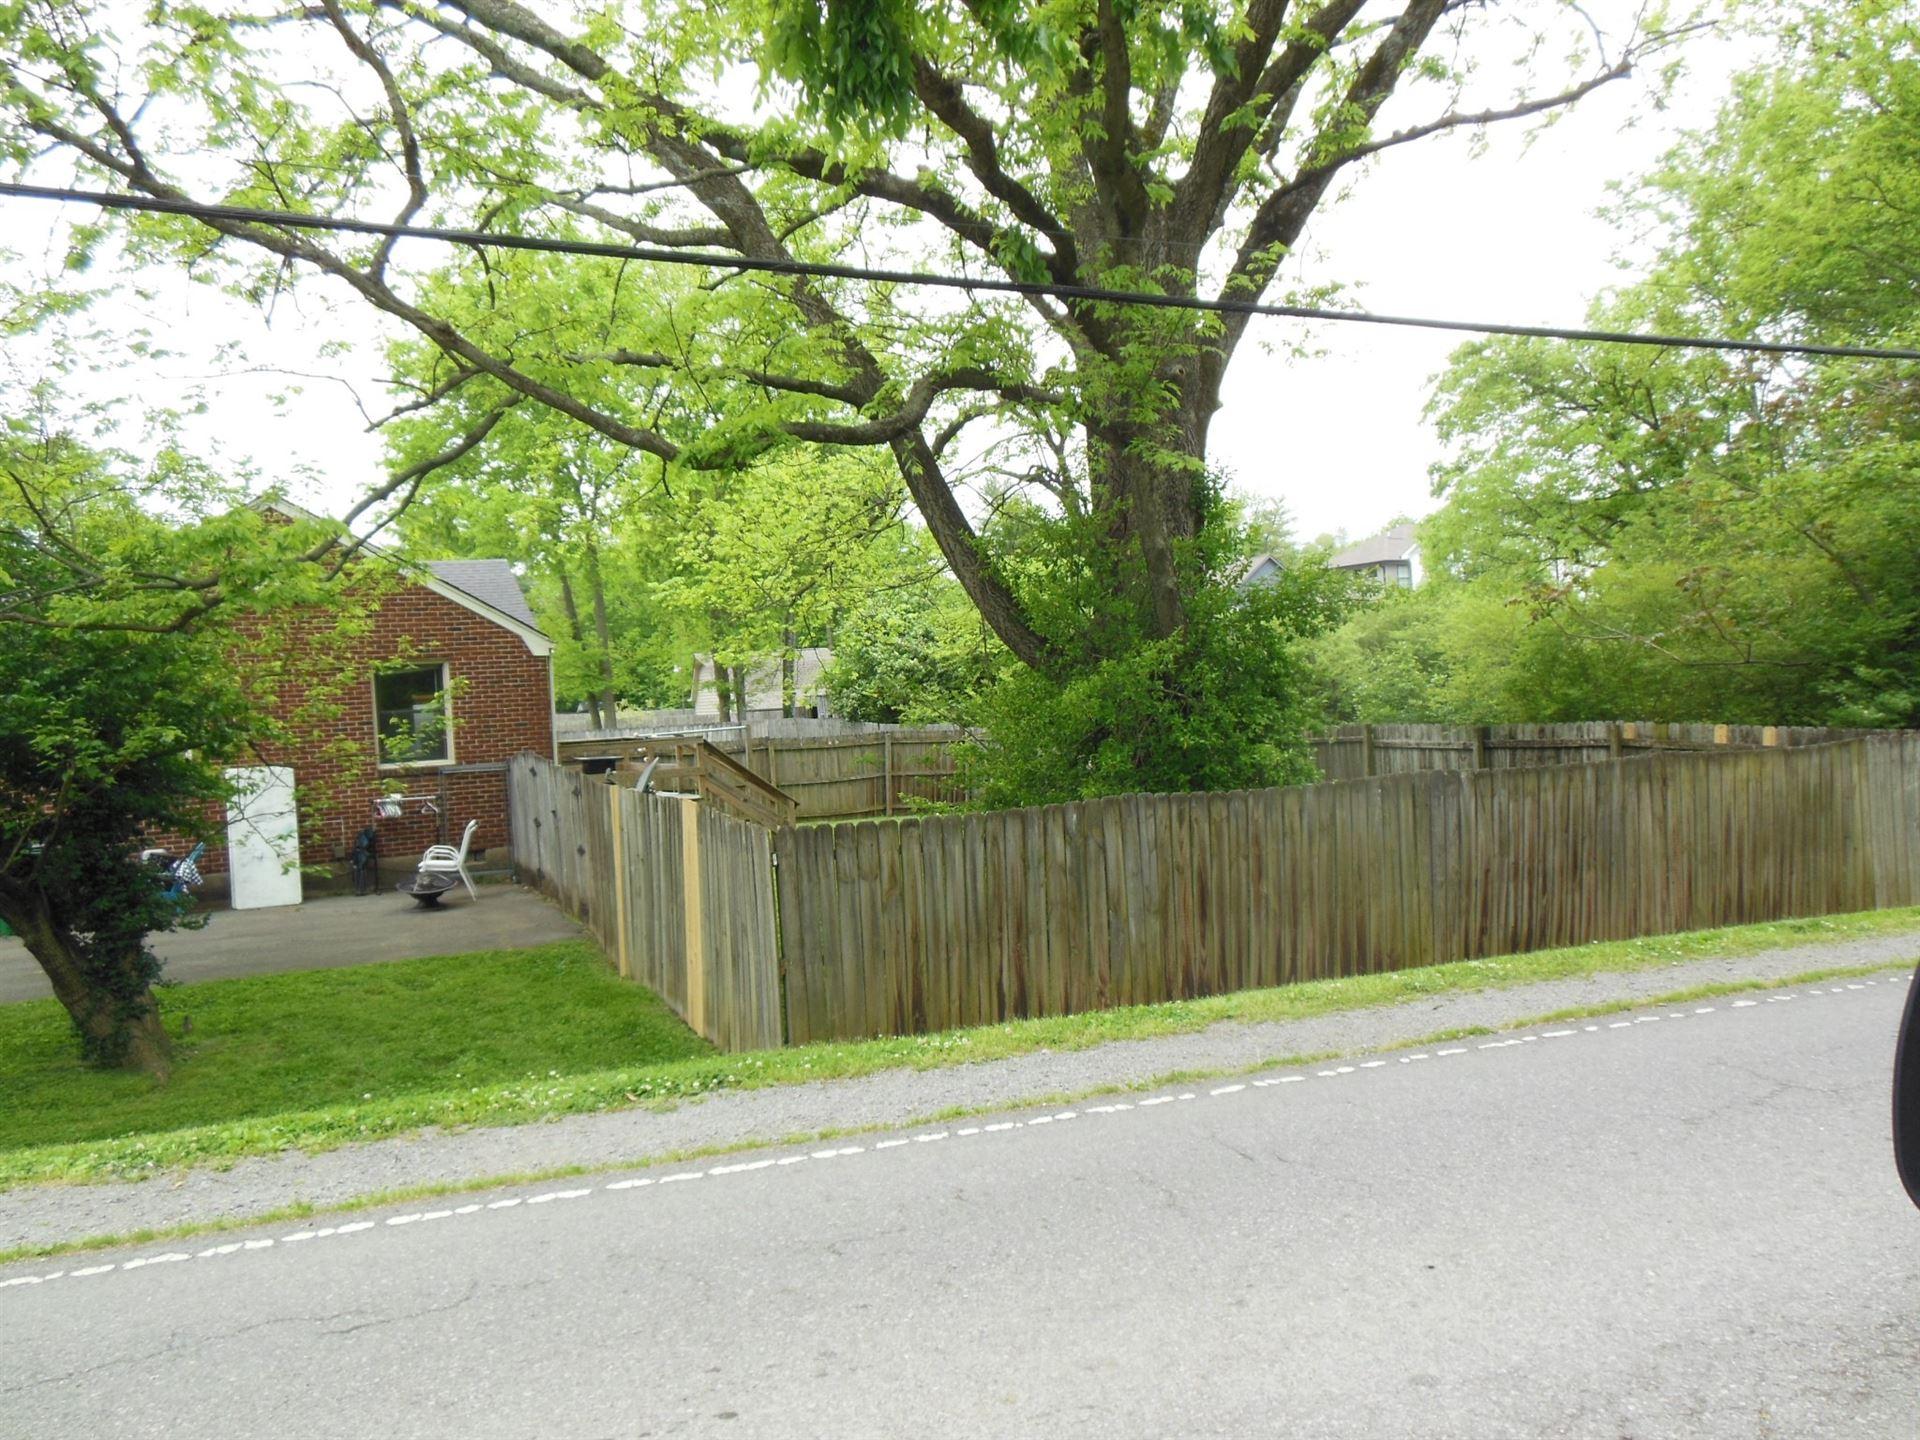 Photo of 1000 Caldwell Ln, Nashville, TN 37204 (MLS # 2276804)